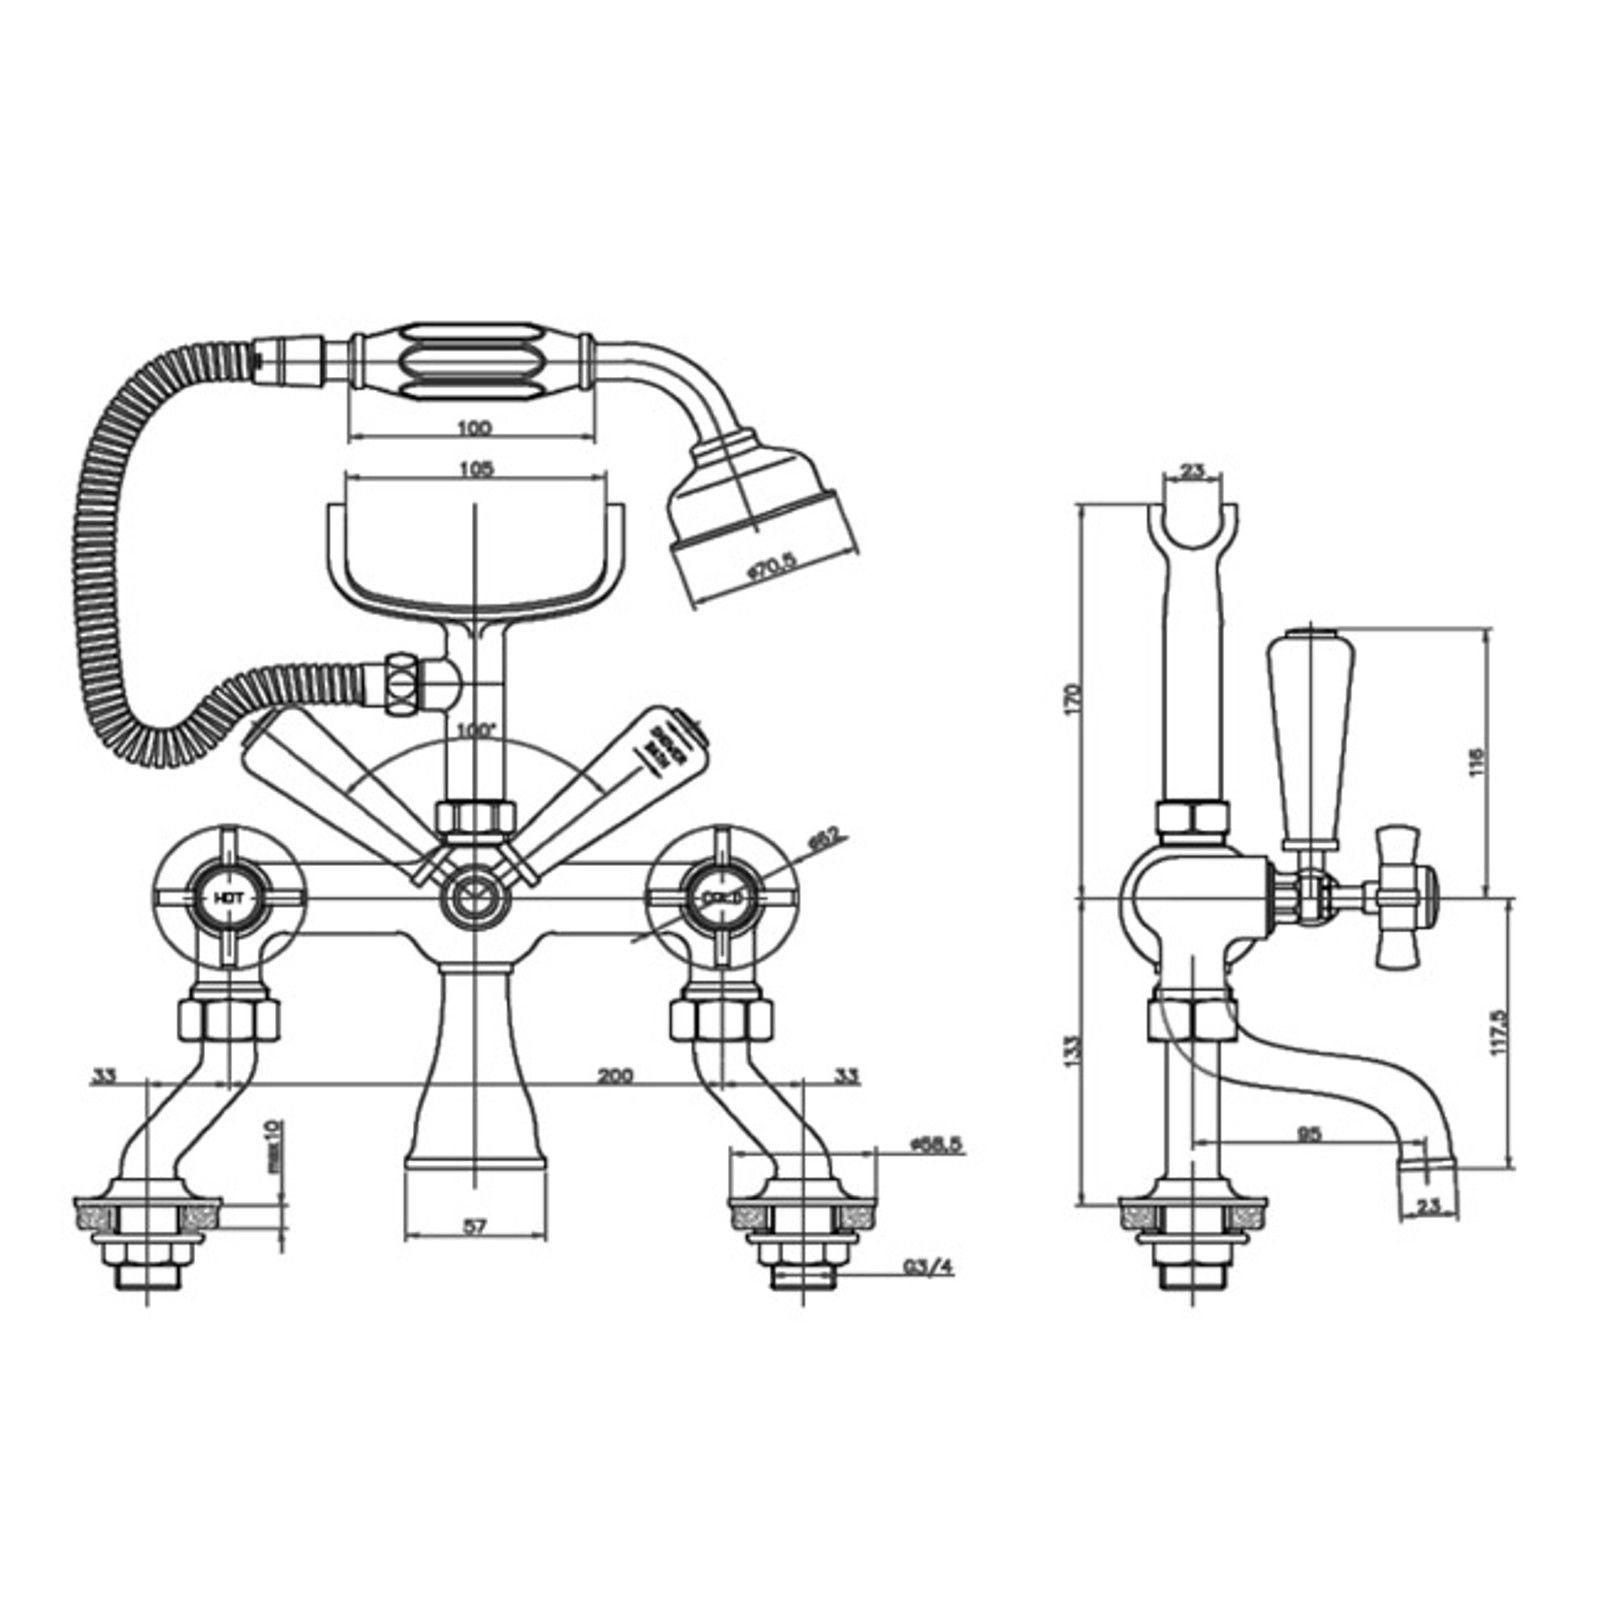 Windsor Bath Shower Mixer Tap Cranked Legs With Rigid Riser Rail Kit